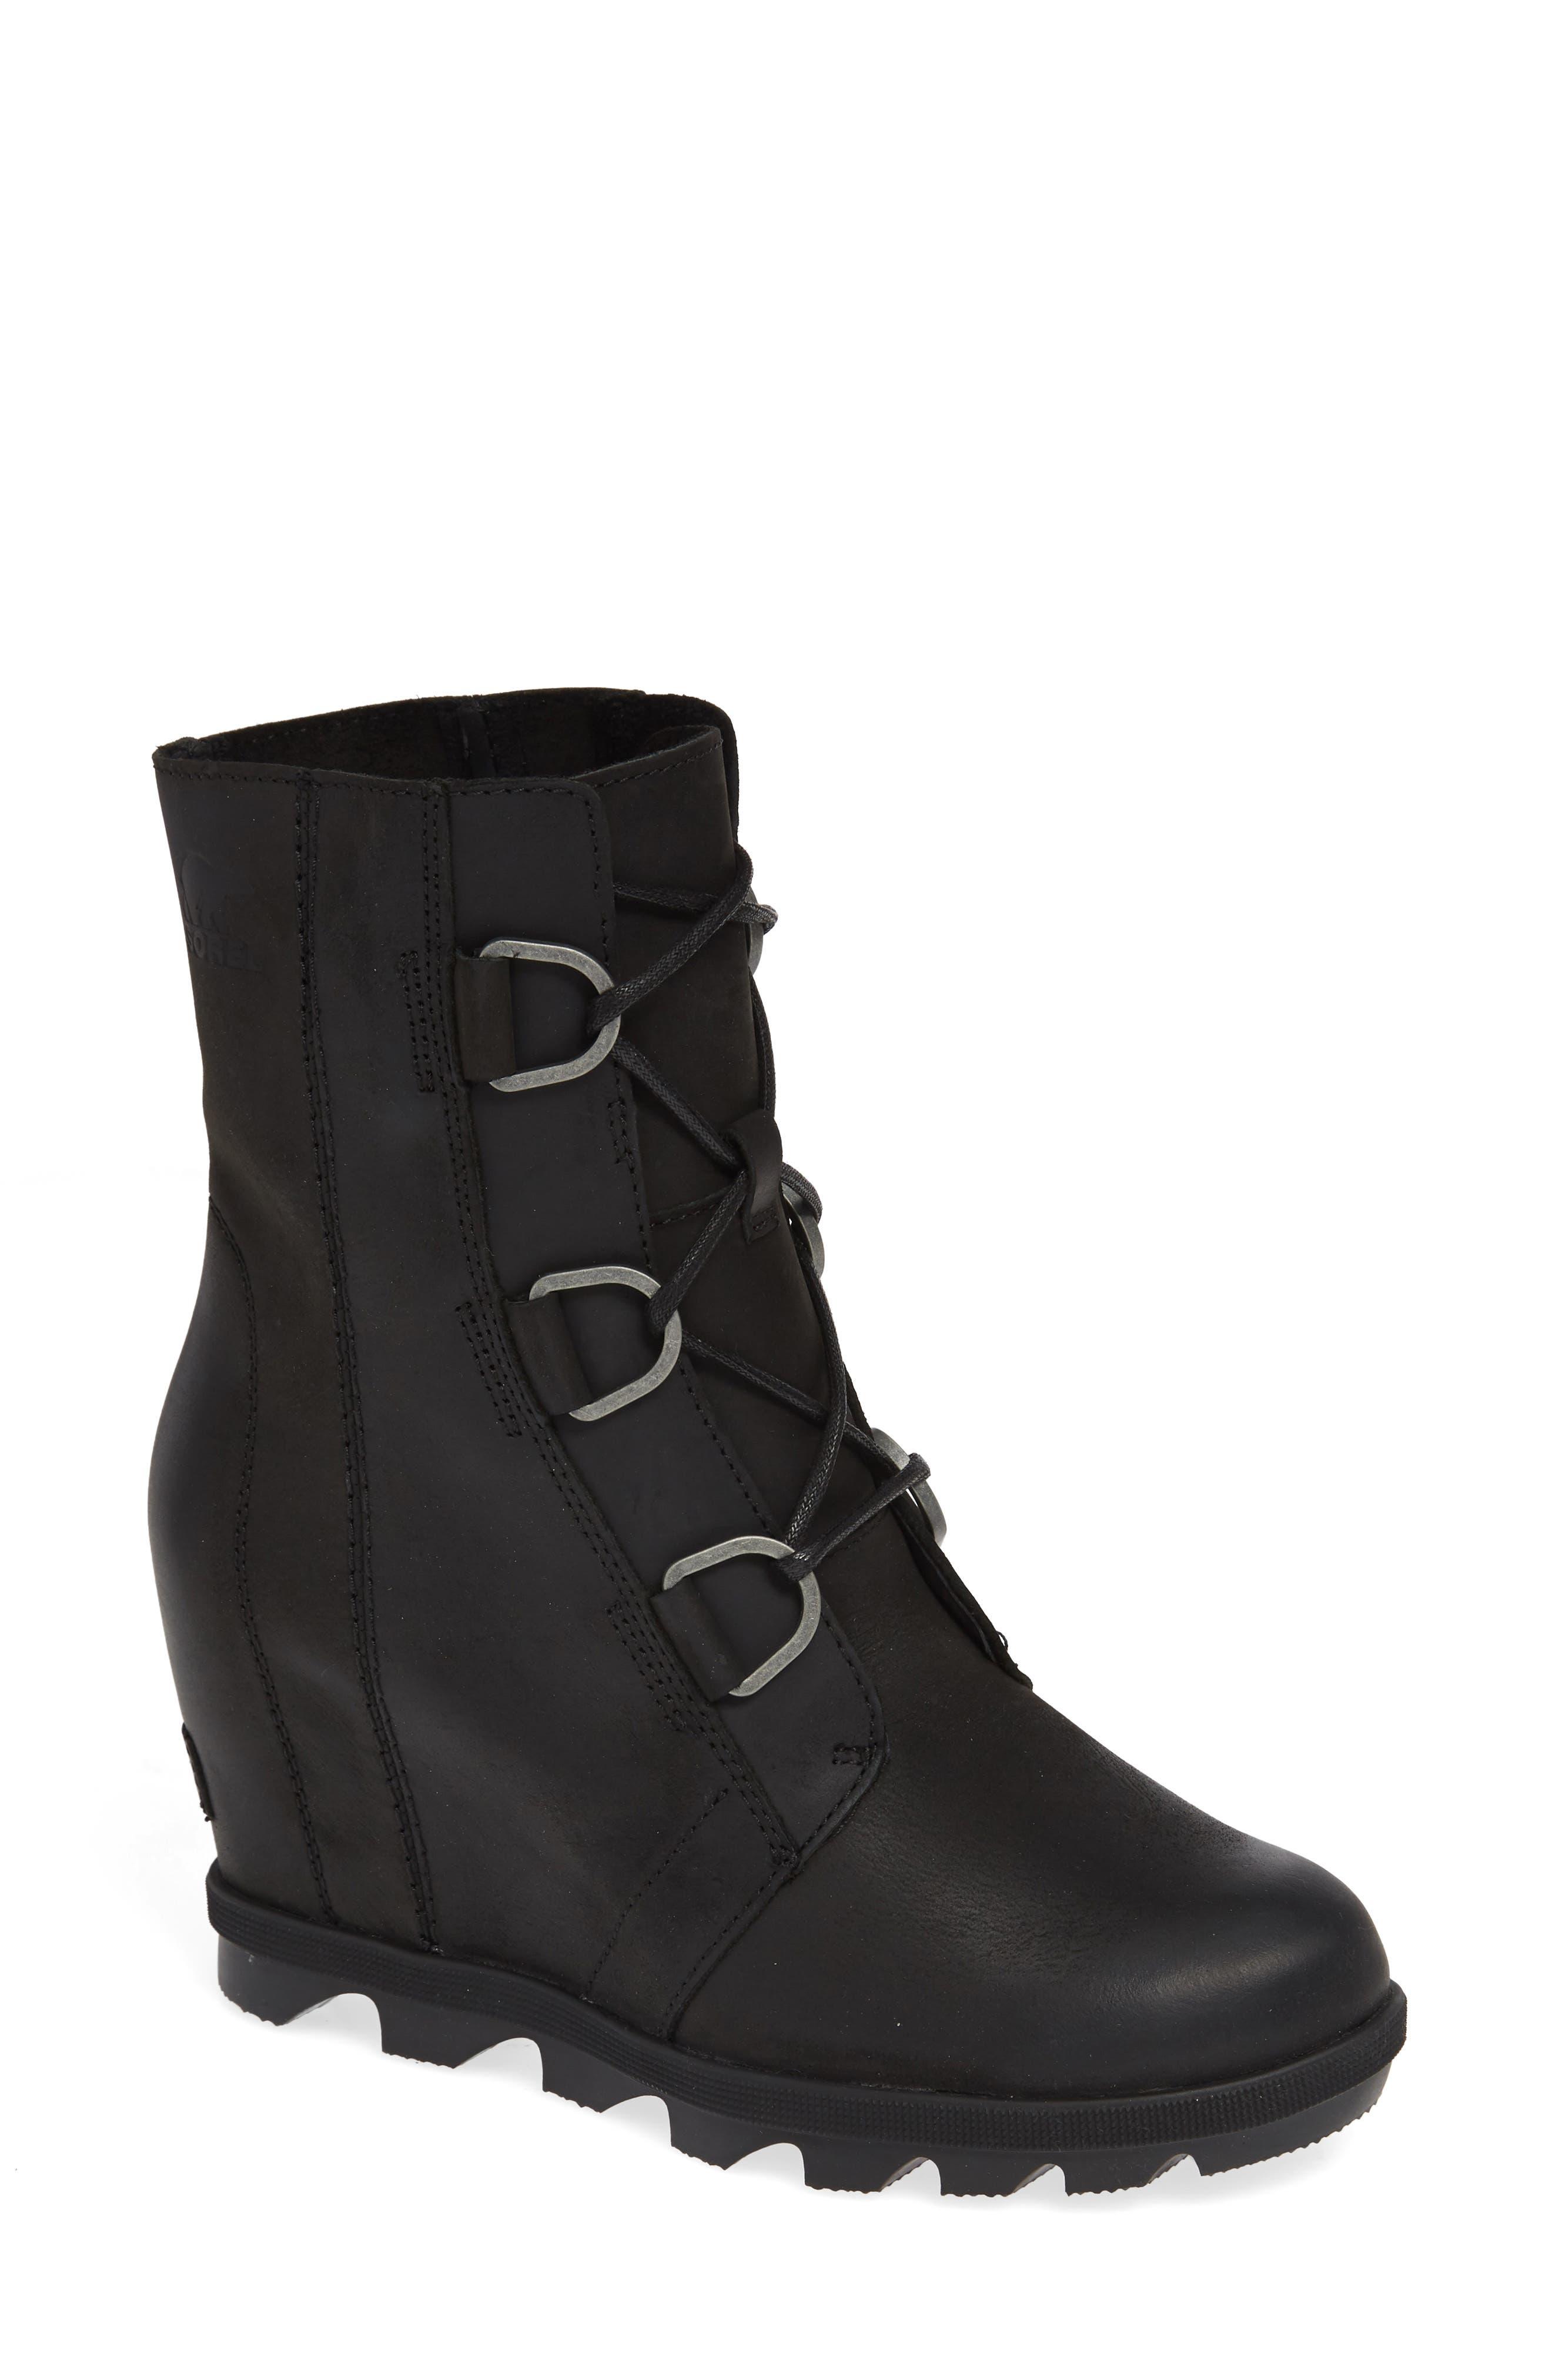 Black Booties \u0026 Ankle Boots   Nordstrom